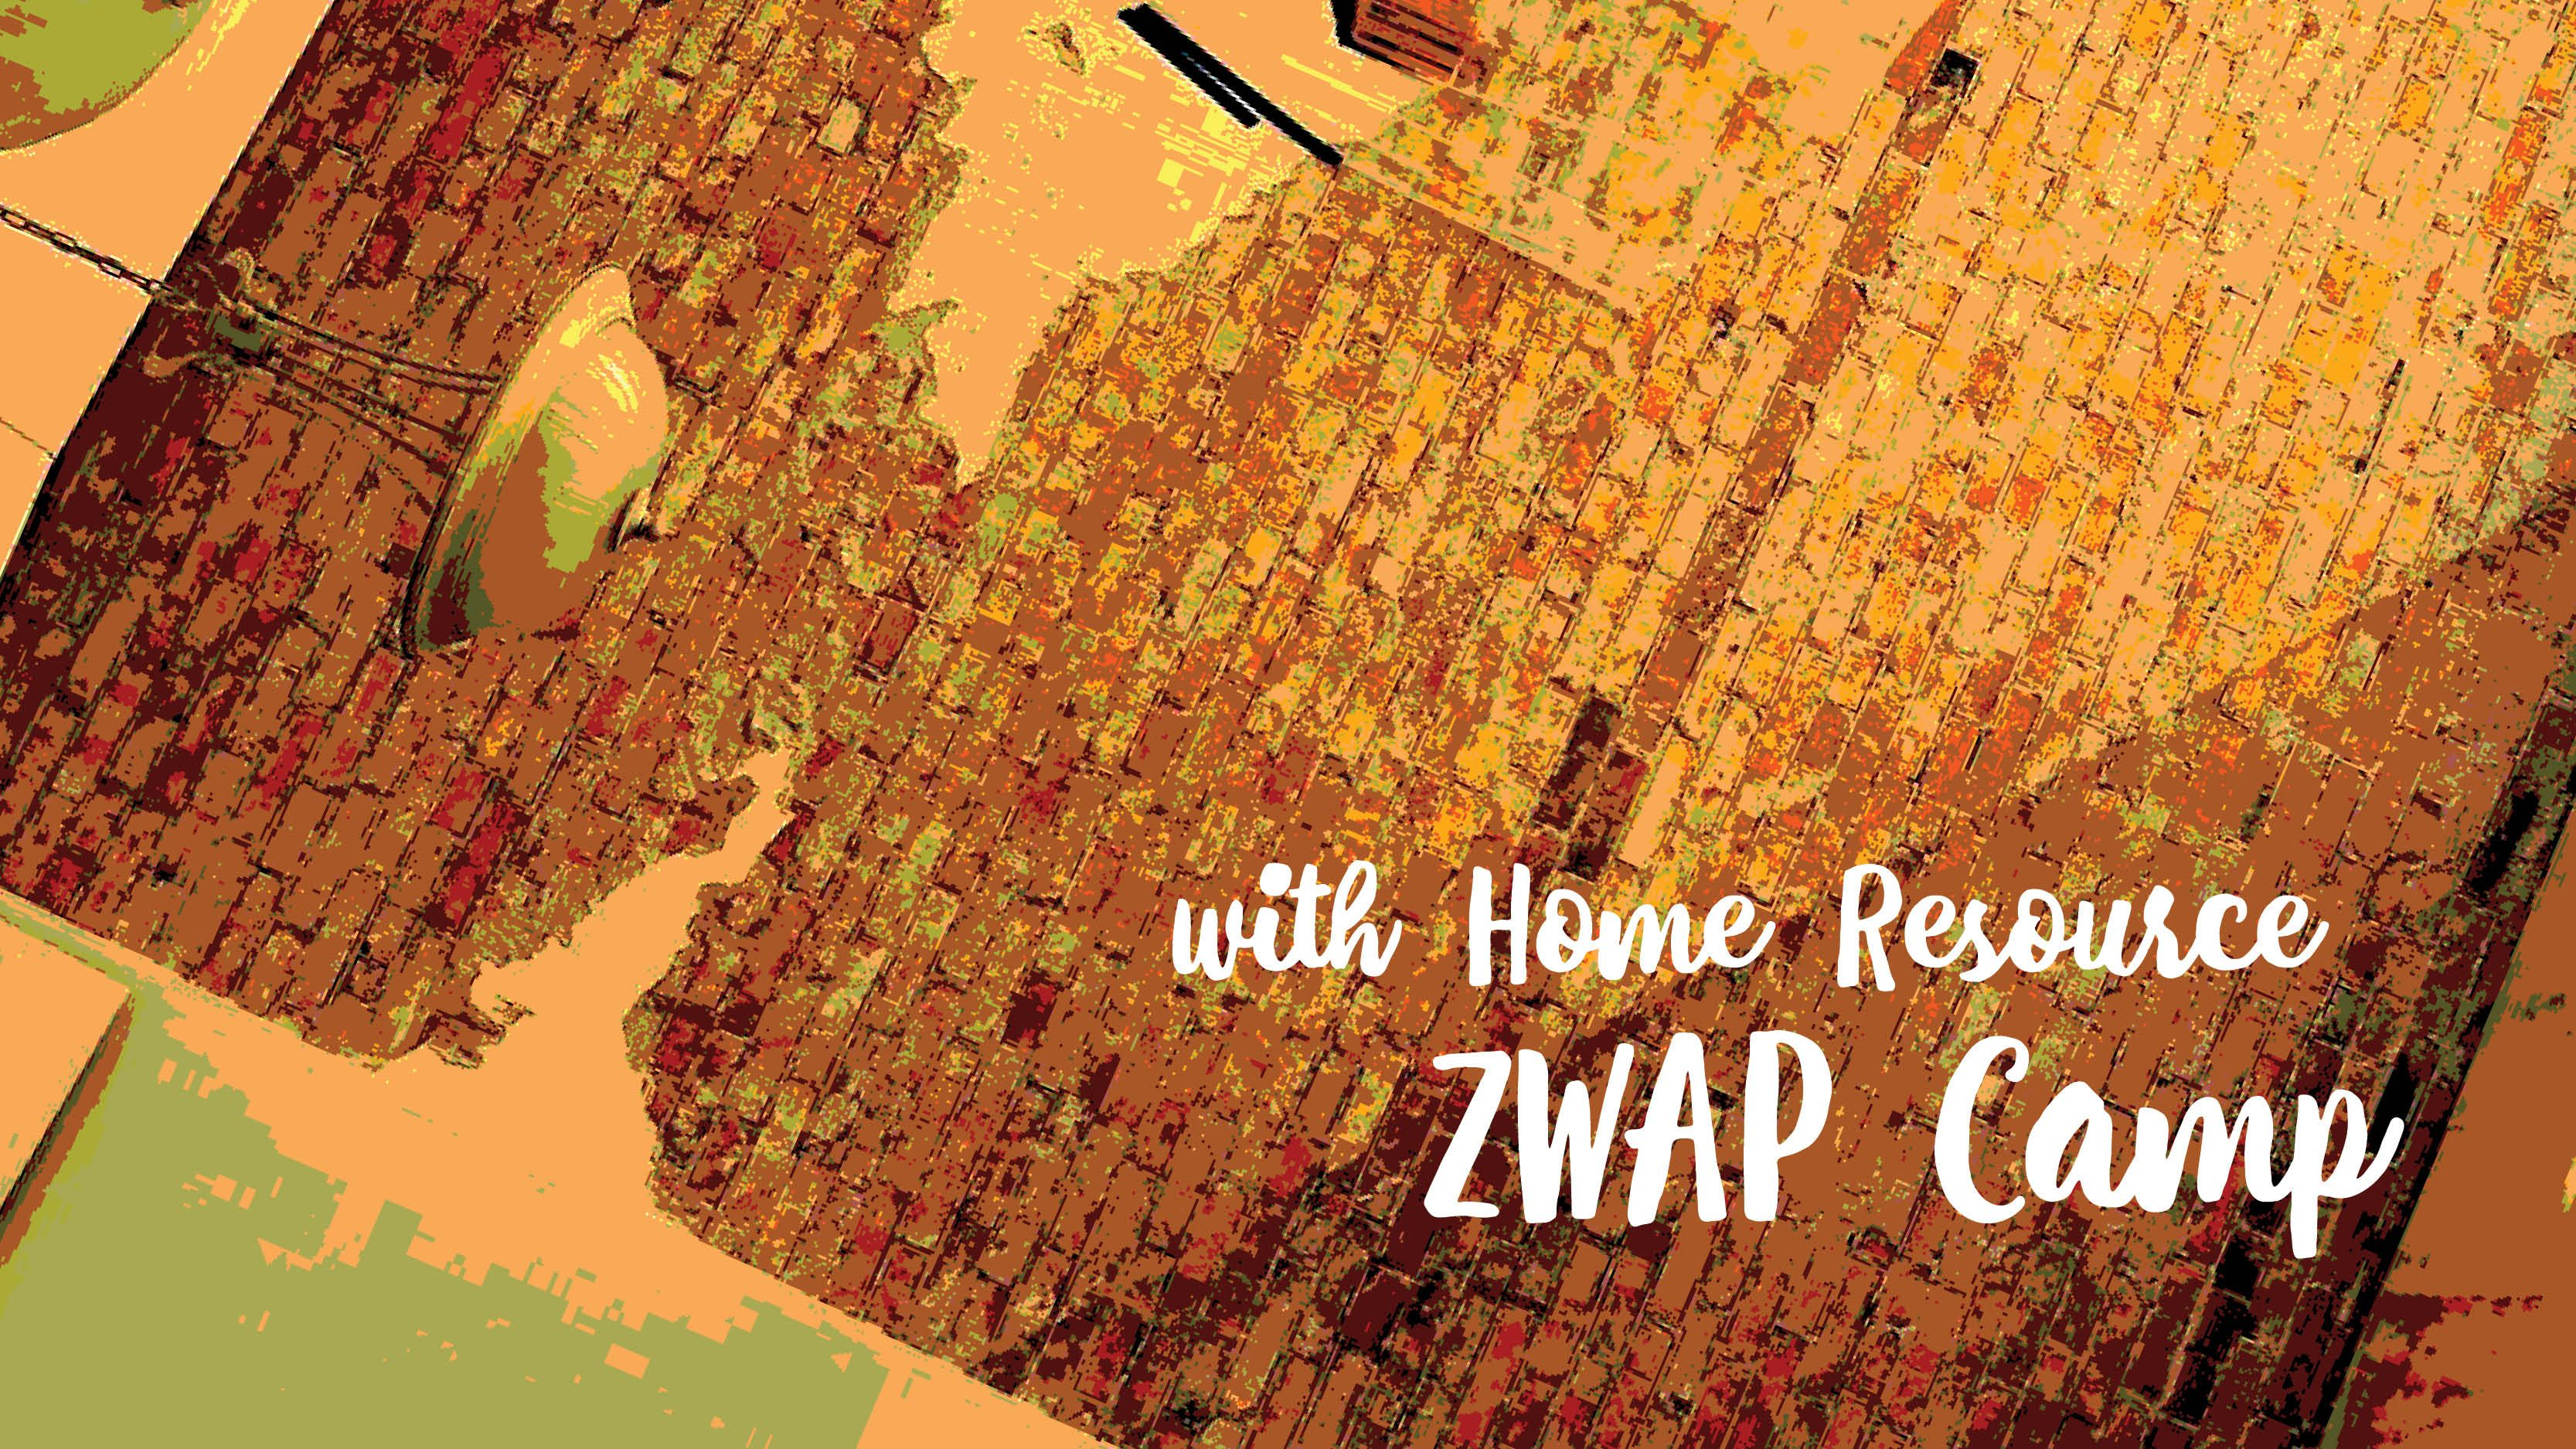 ZWAP Camp with Home ReSource